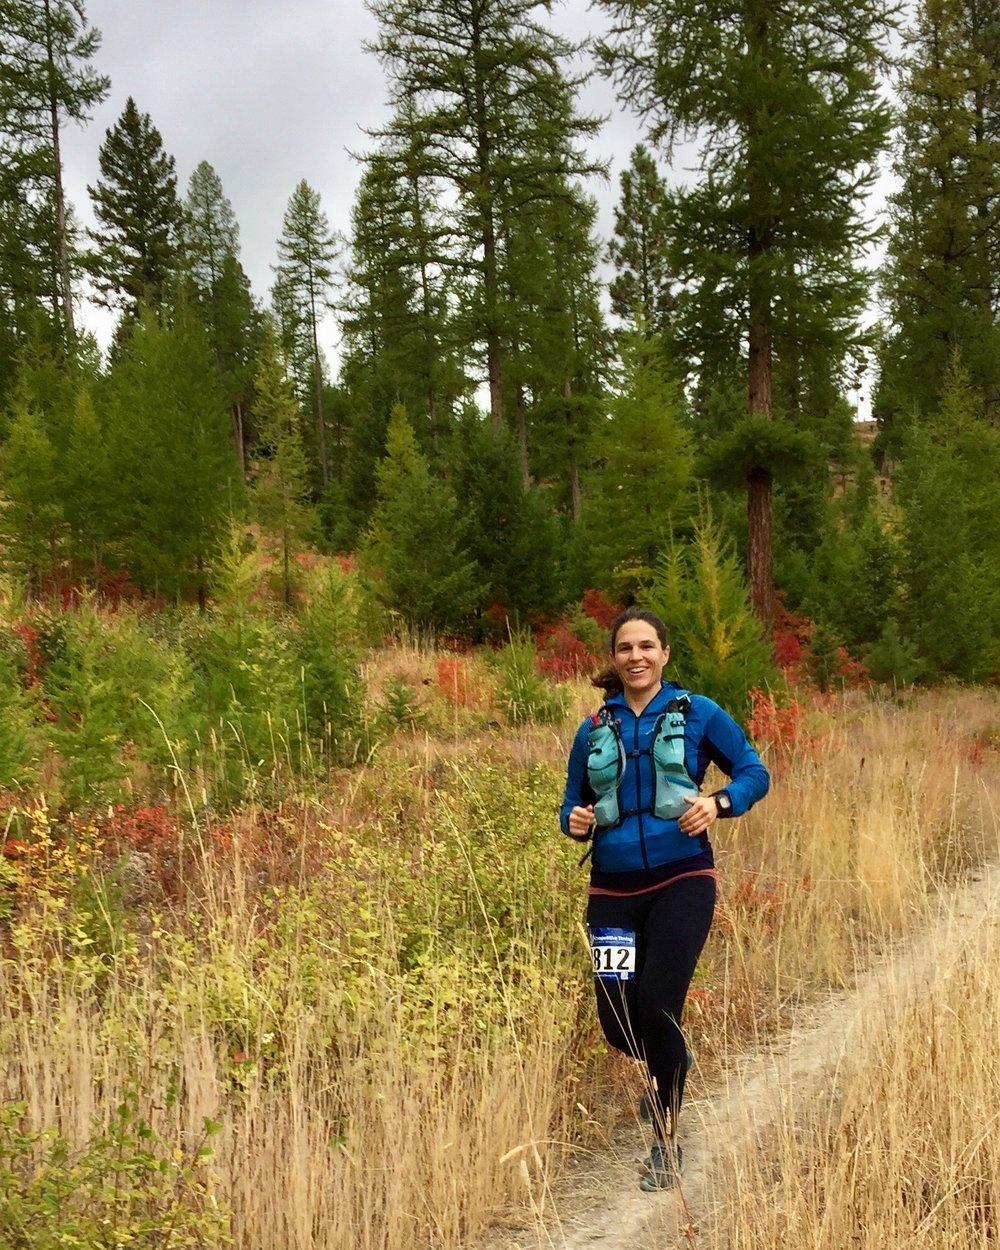 foys to blacktail trails trail marathon ftbtIMG_6654.JPG